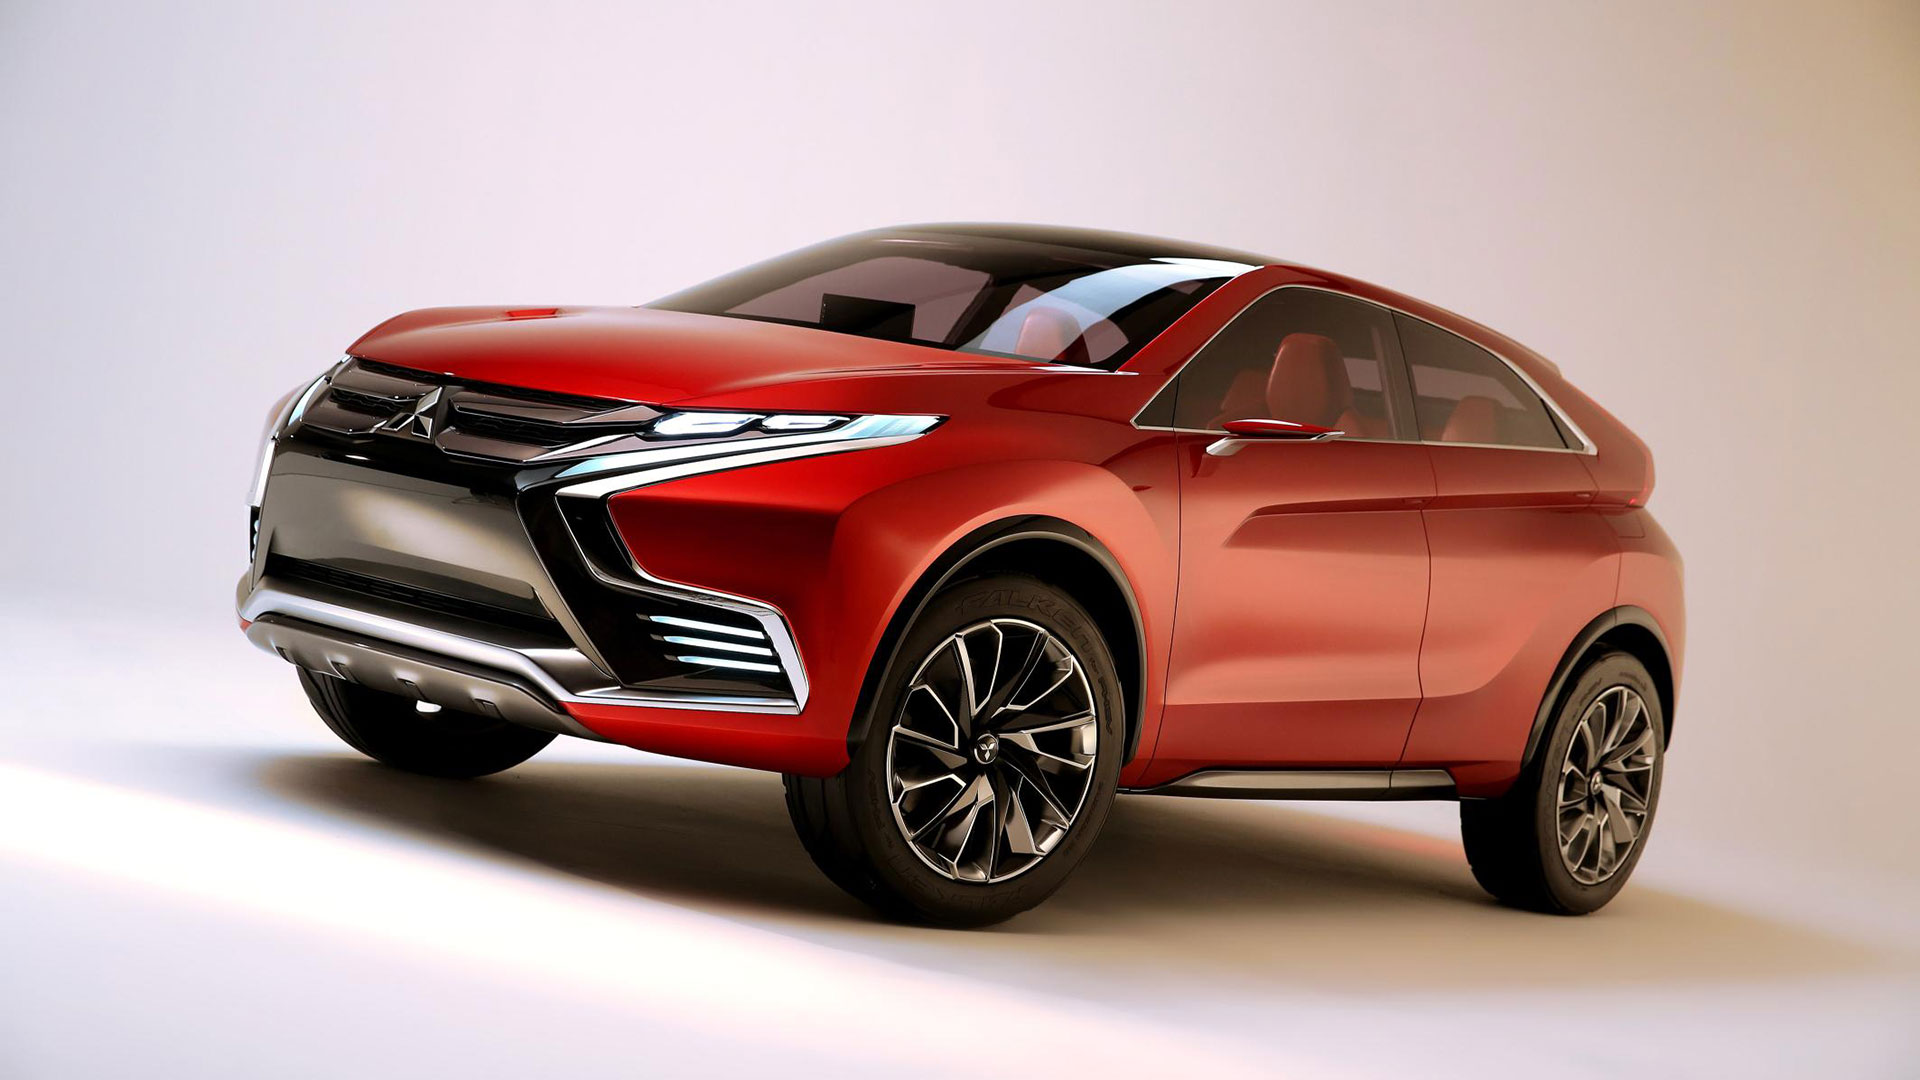 Mitsubishi plans five new SUVs by 2021 | Auto Trader UK